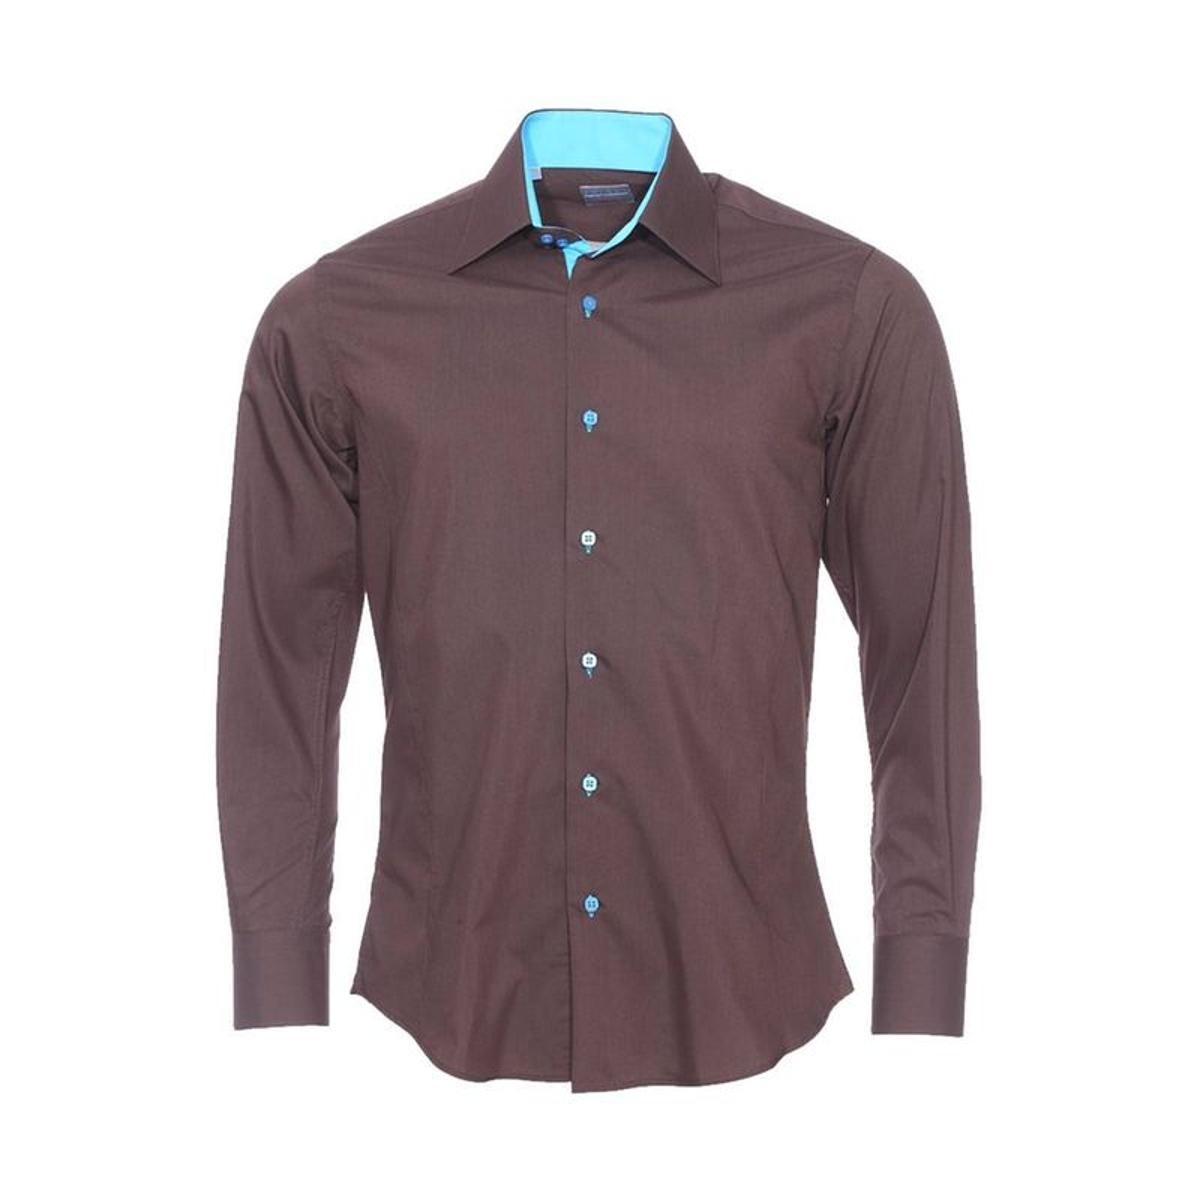 Toldot - chemise